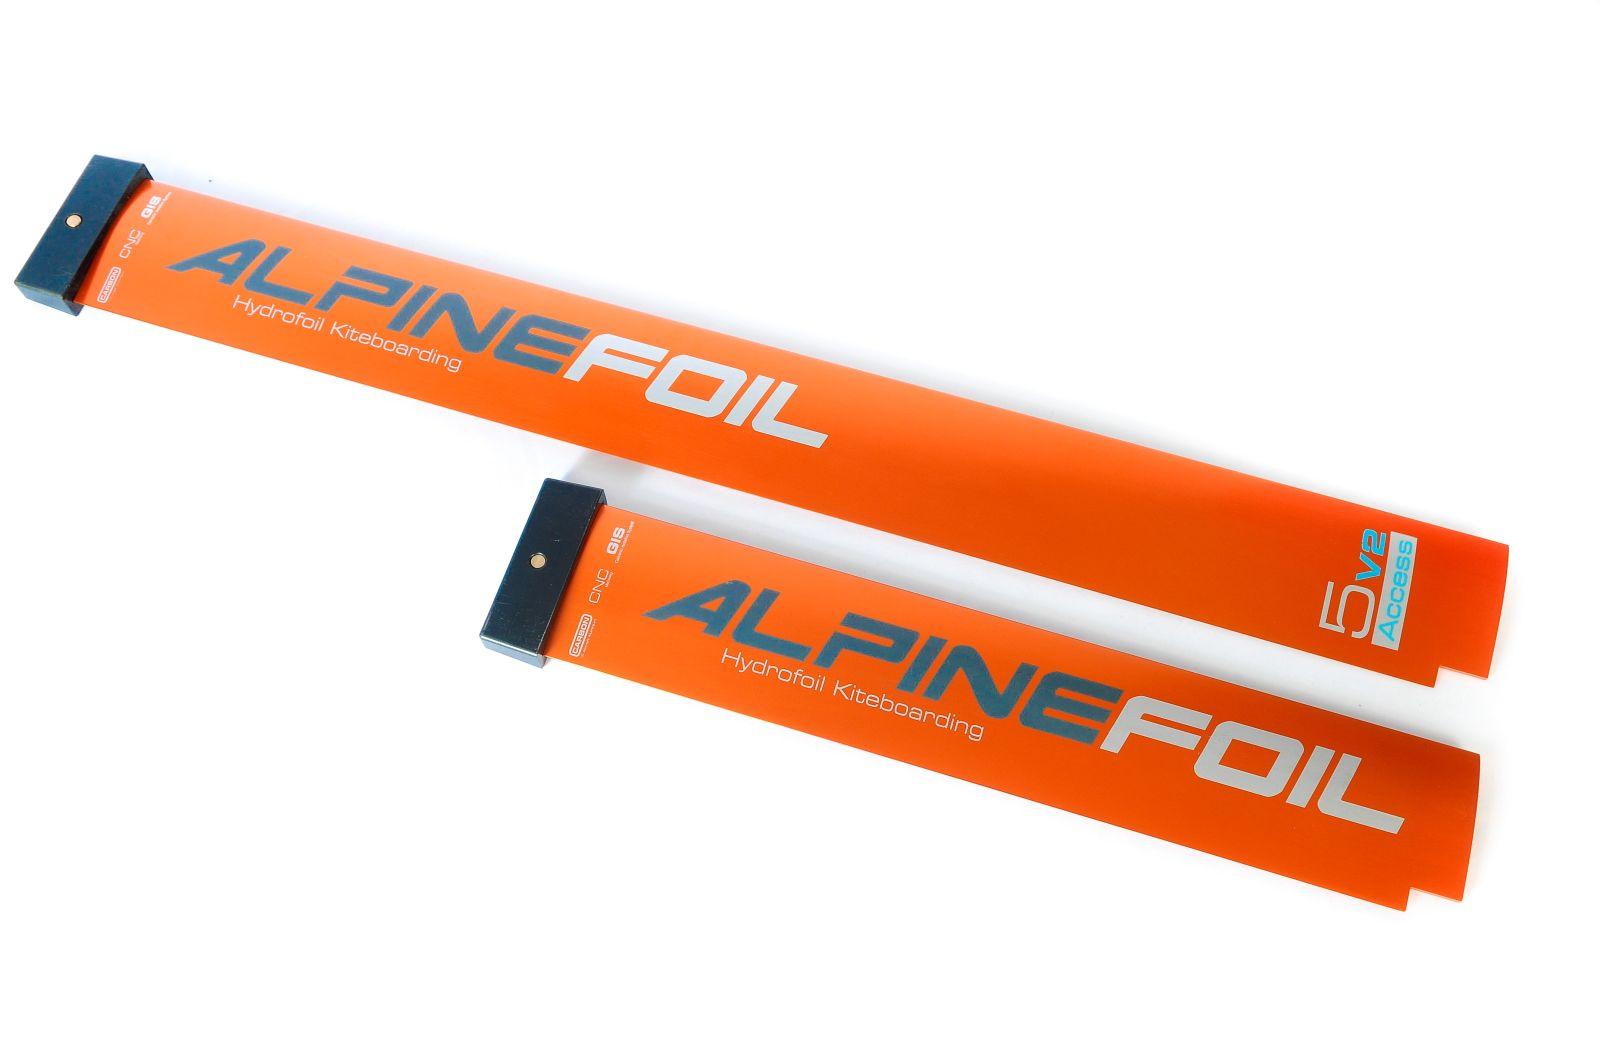 Kitefoil carbon aluminium alpinefoil 5 0 access v2 2788 1